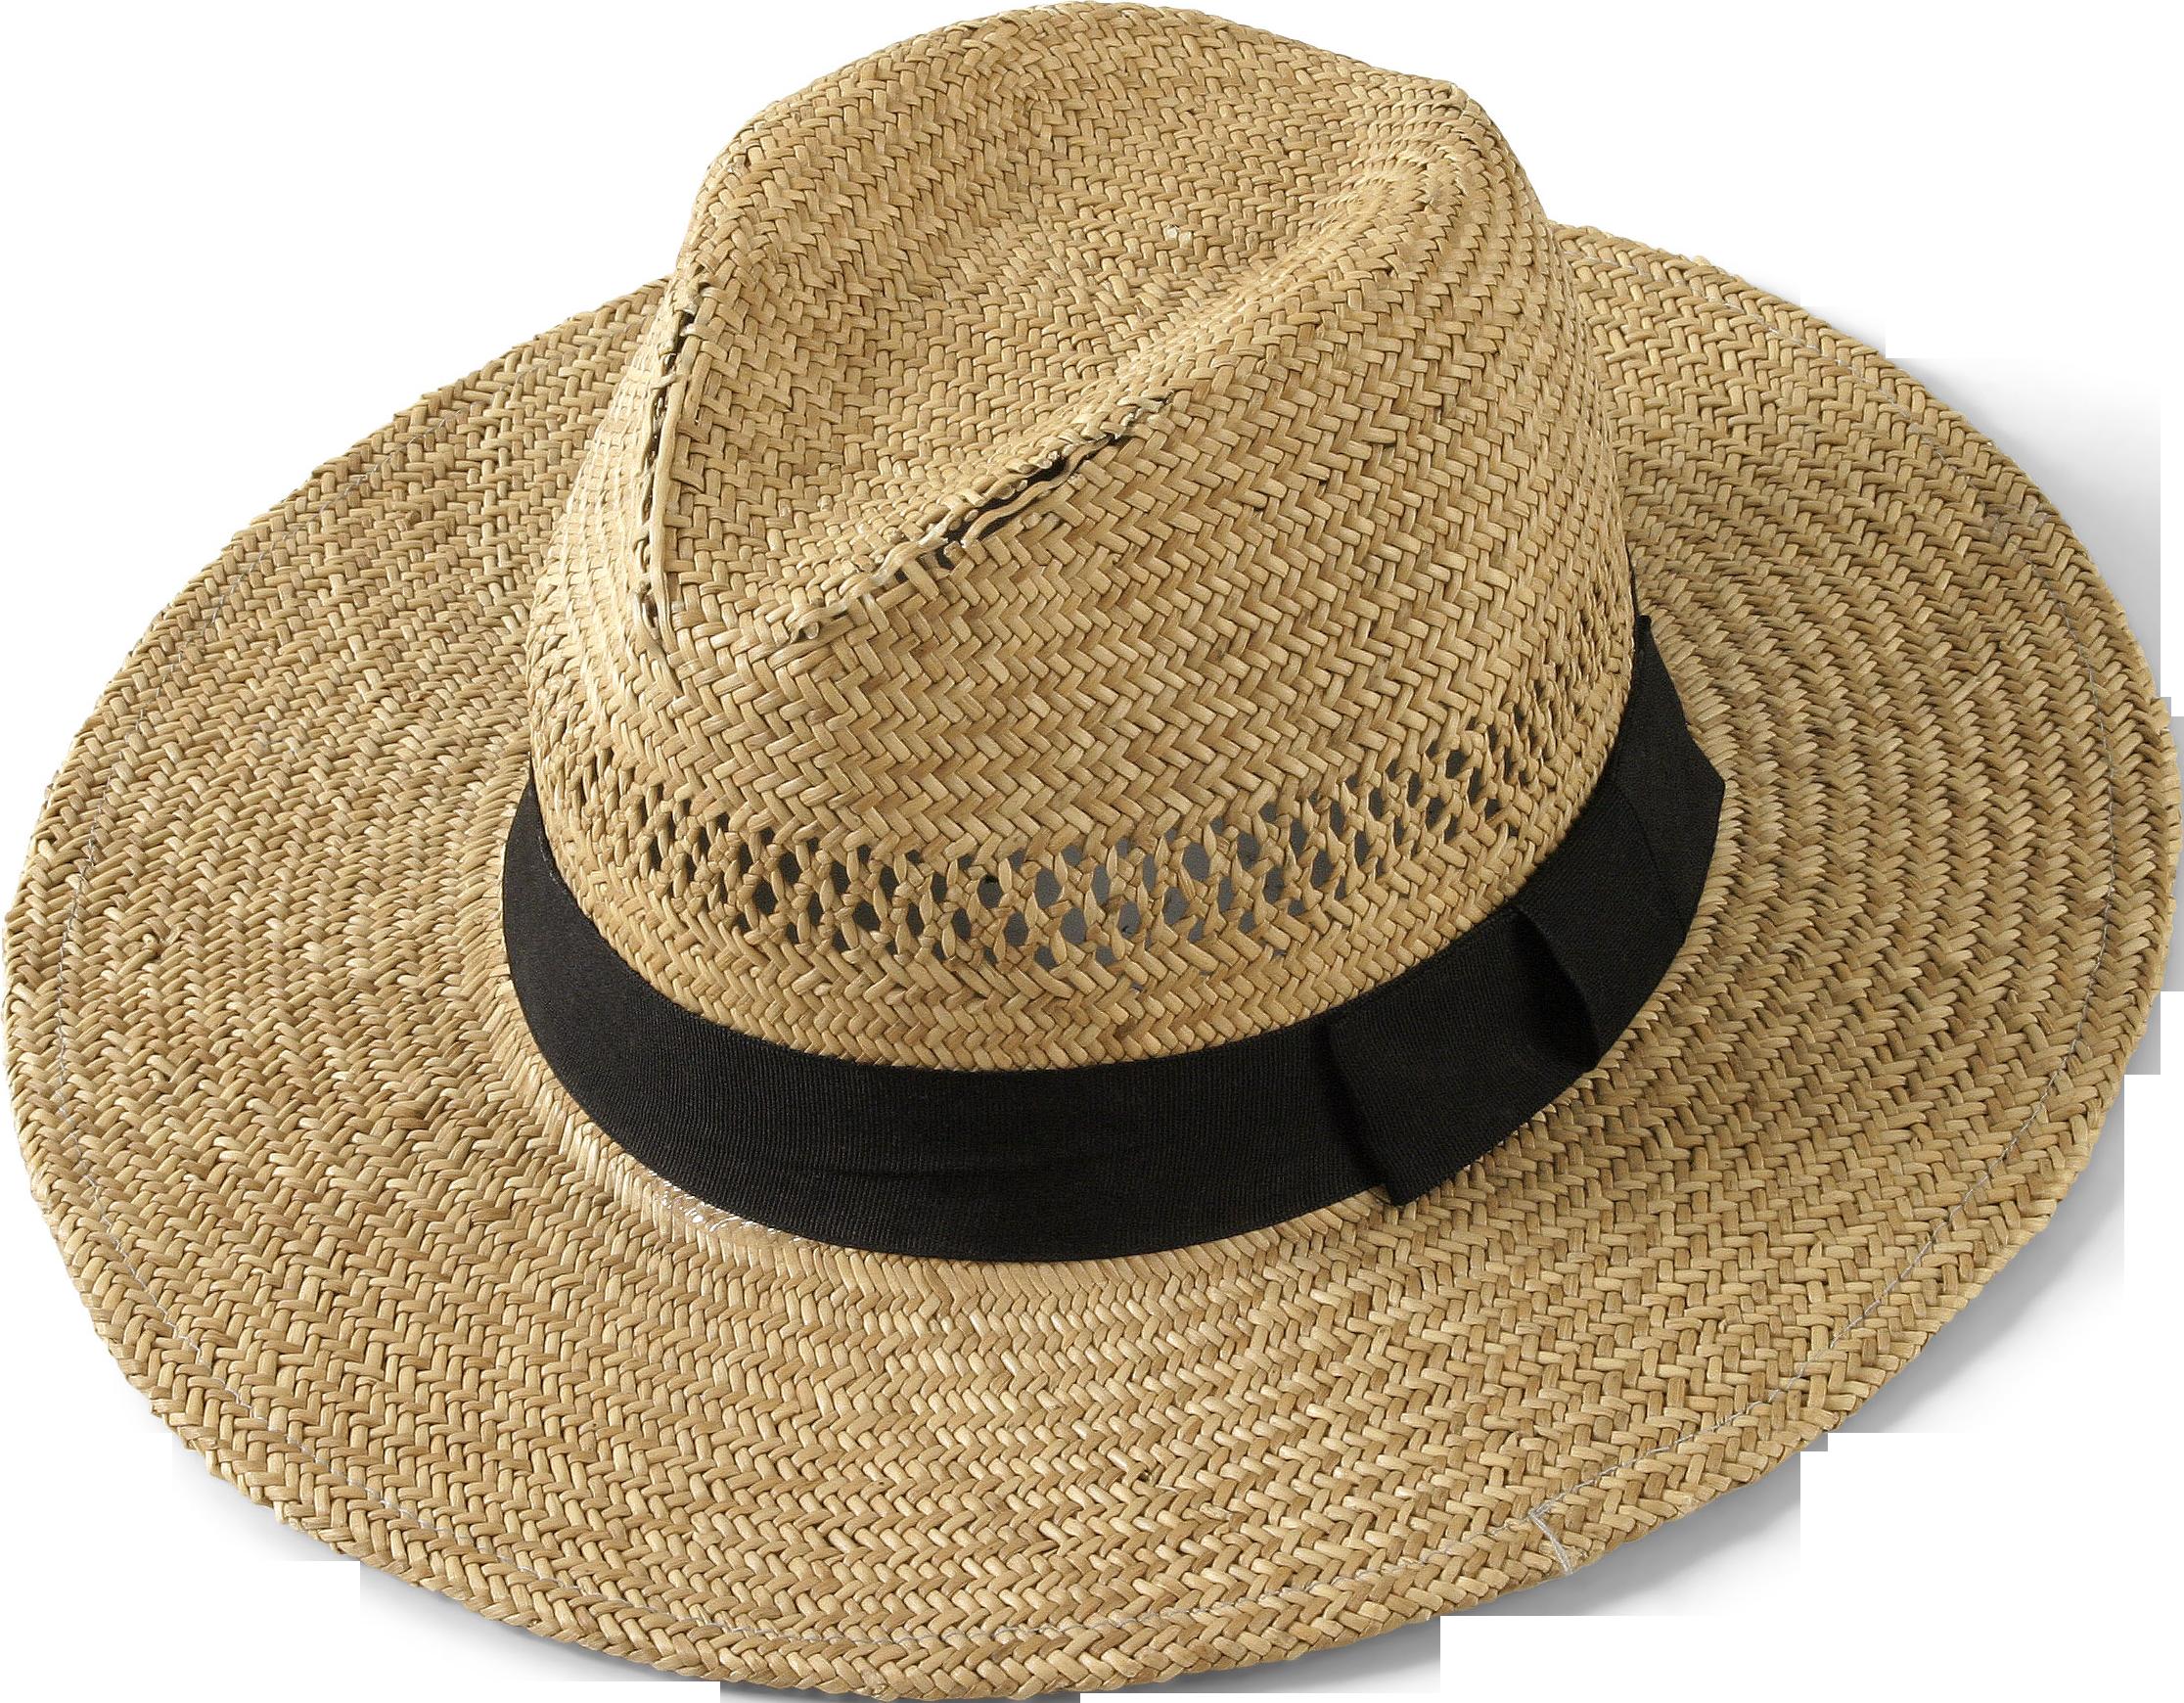 Hat PNG image - PNG Sun Hat